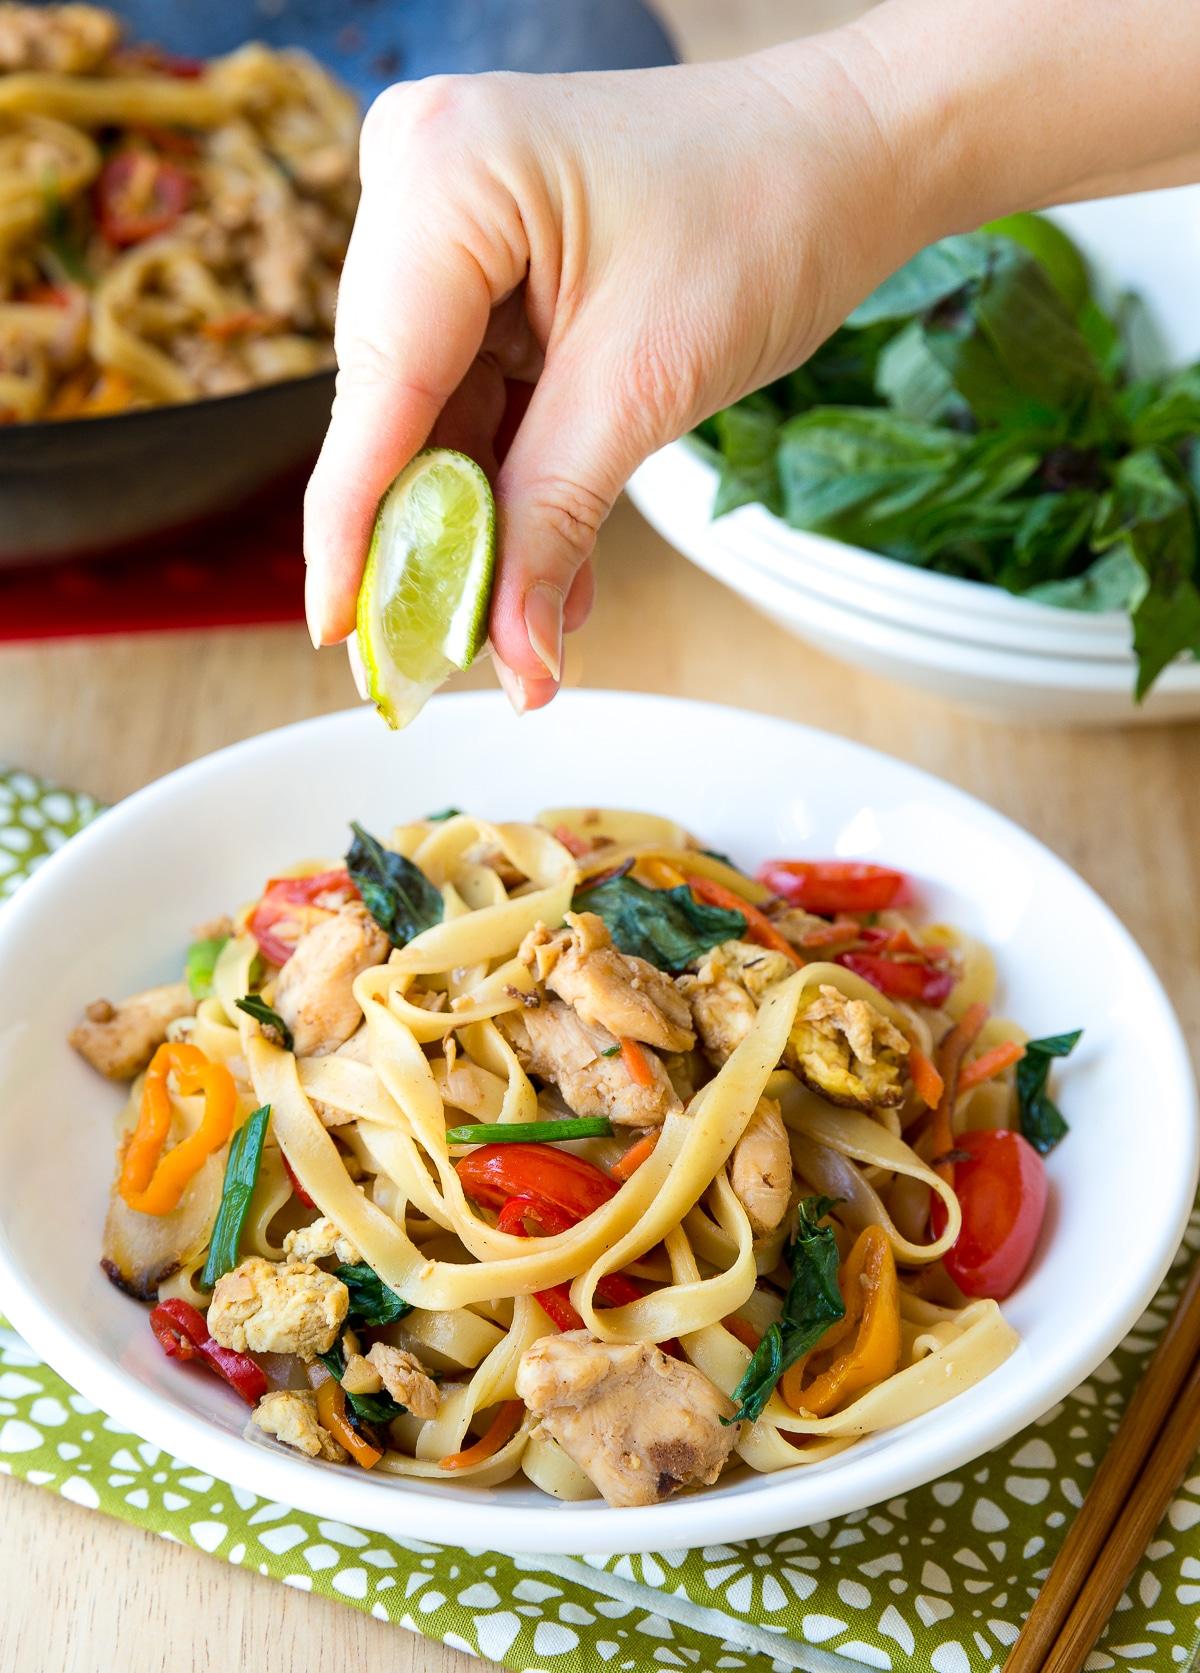 Thai Pad Kee Mao Recipe (Drunken Noodles) #ASpicyPerspective #Thai #Recipe #Noodles #Wok